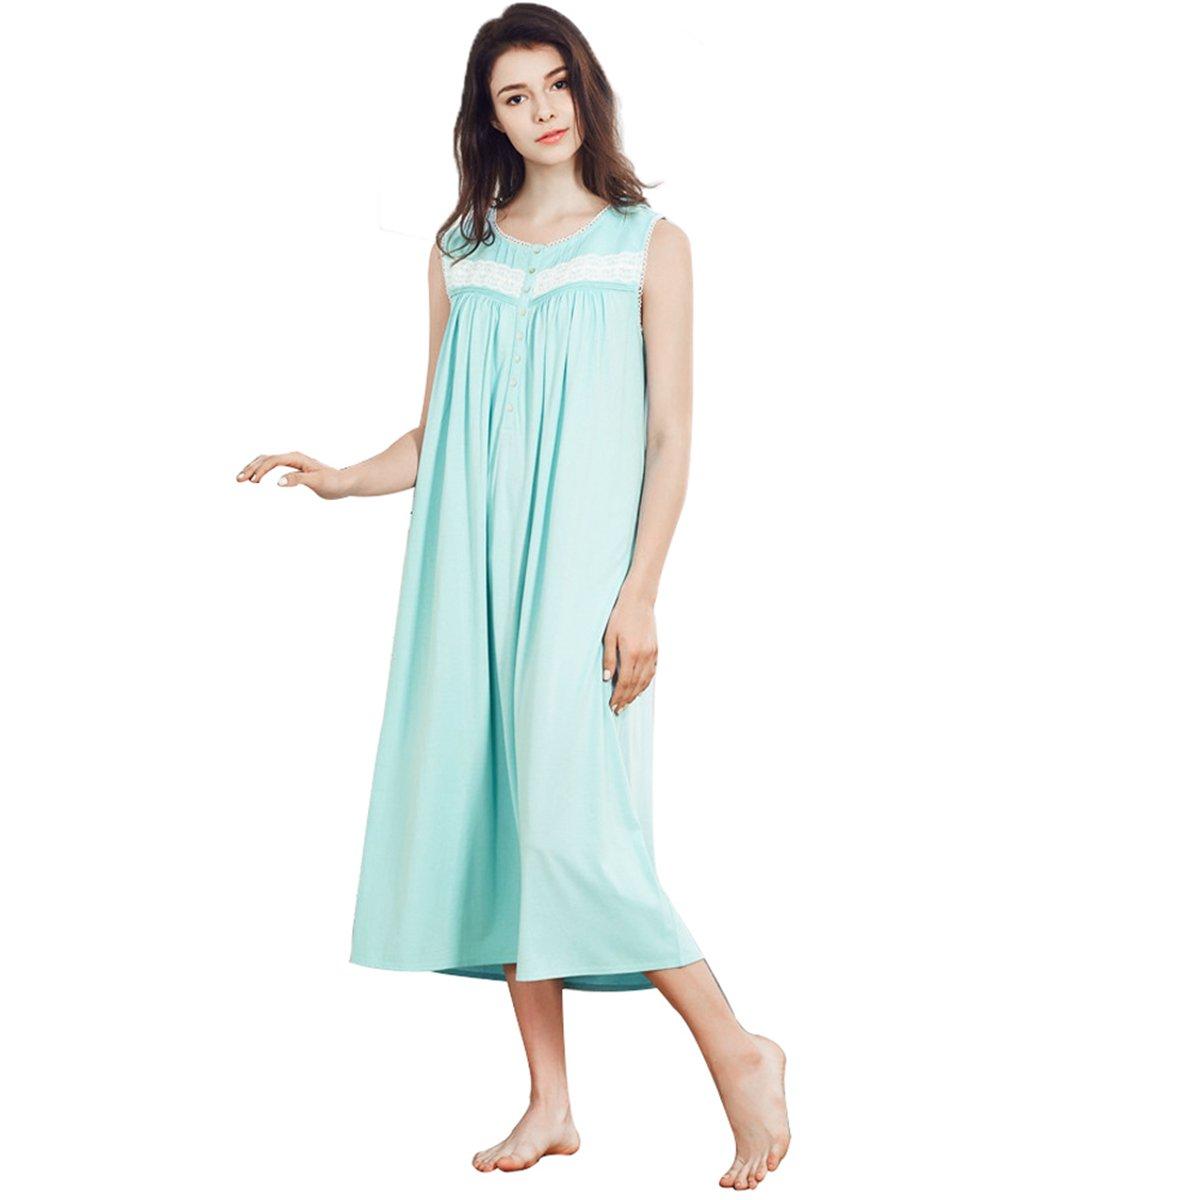 Dorekim Women s 100% Cotton Sleeveless Round Neck Long Sleepwear Nightgown  DK6808 (S)  Amazon.co.uk  Clothing 1c25e29a5